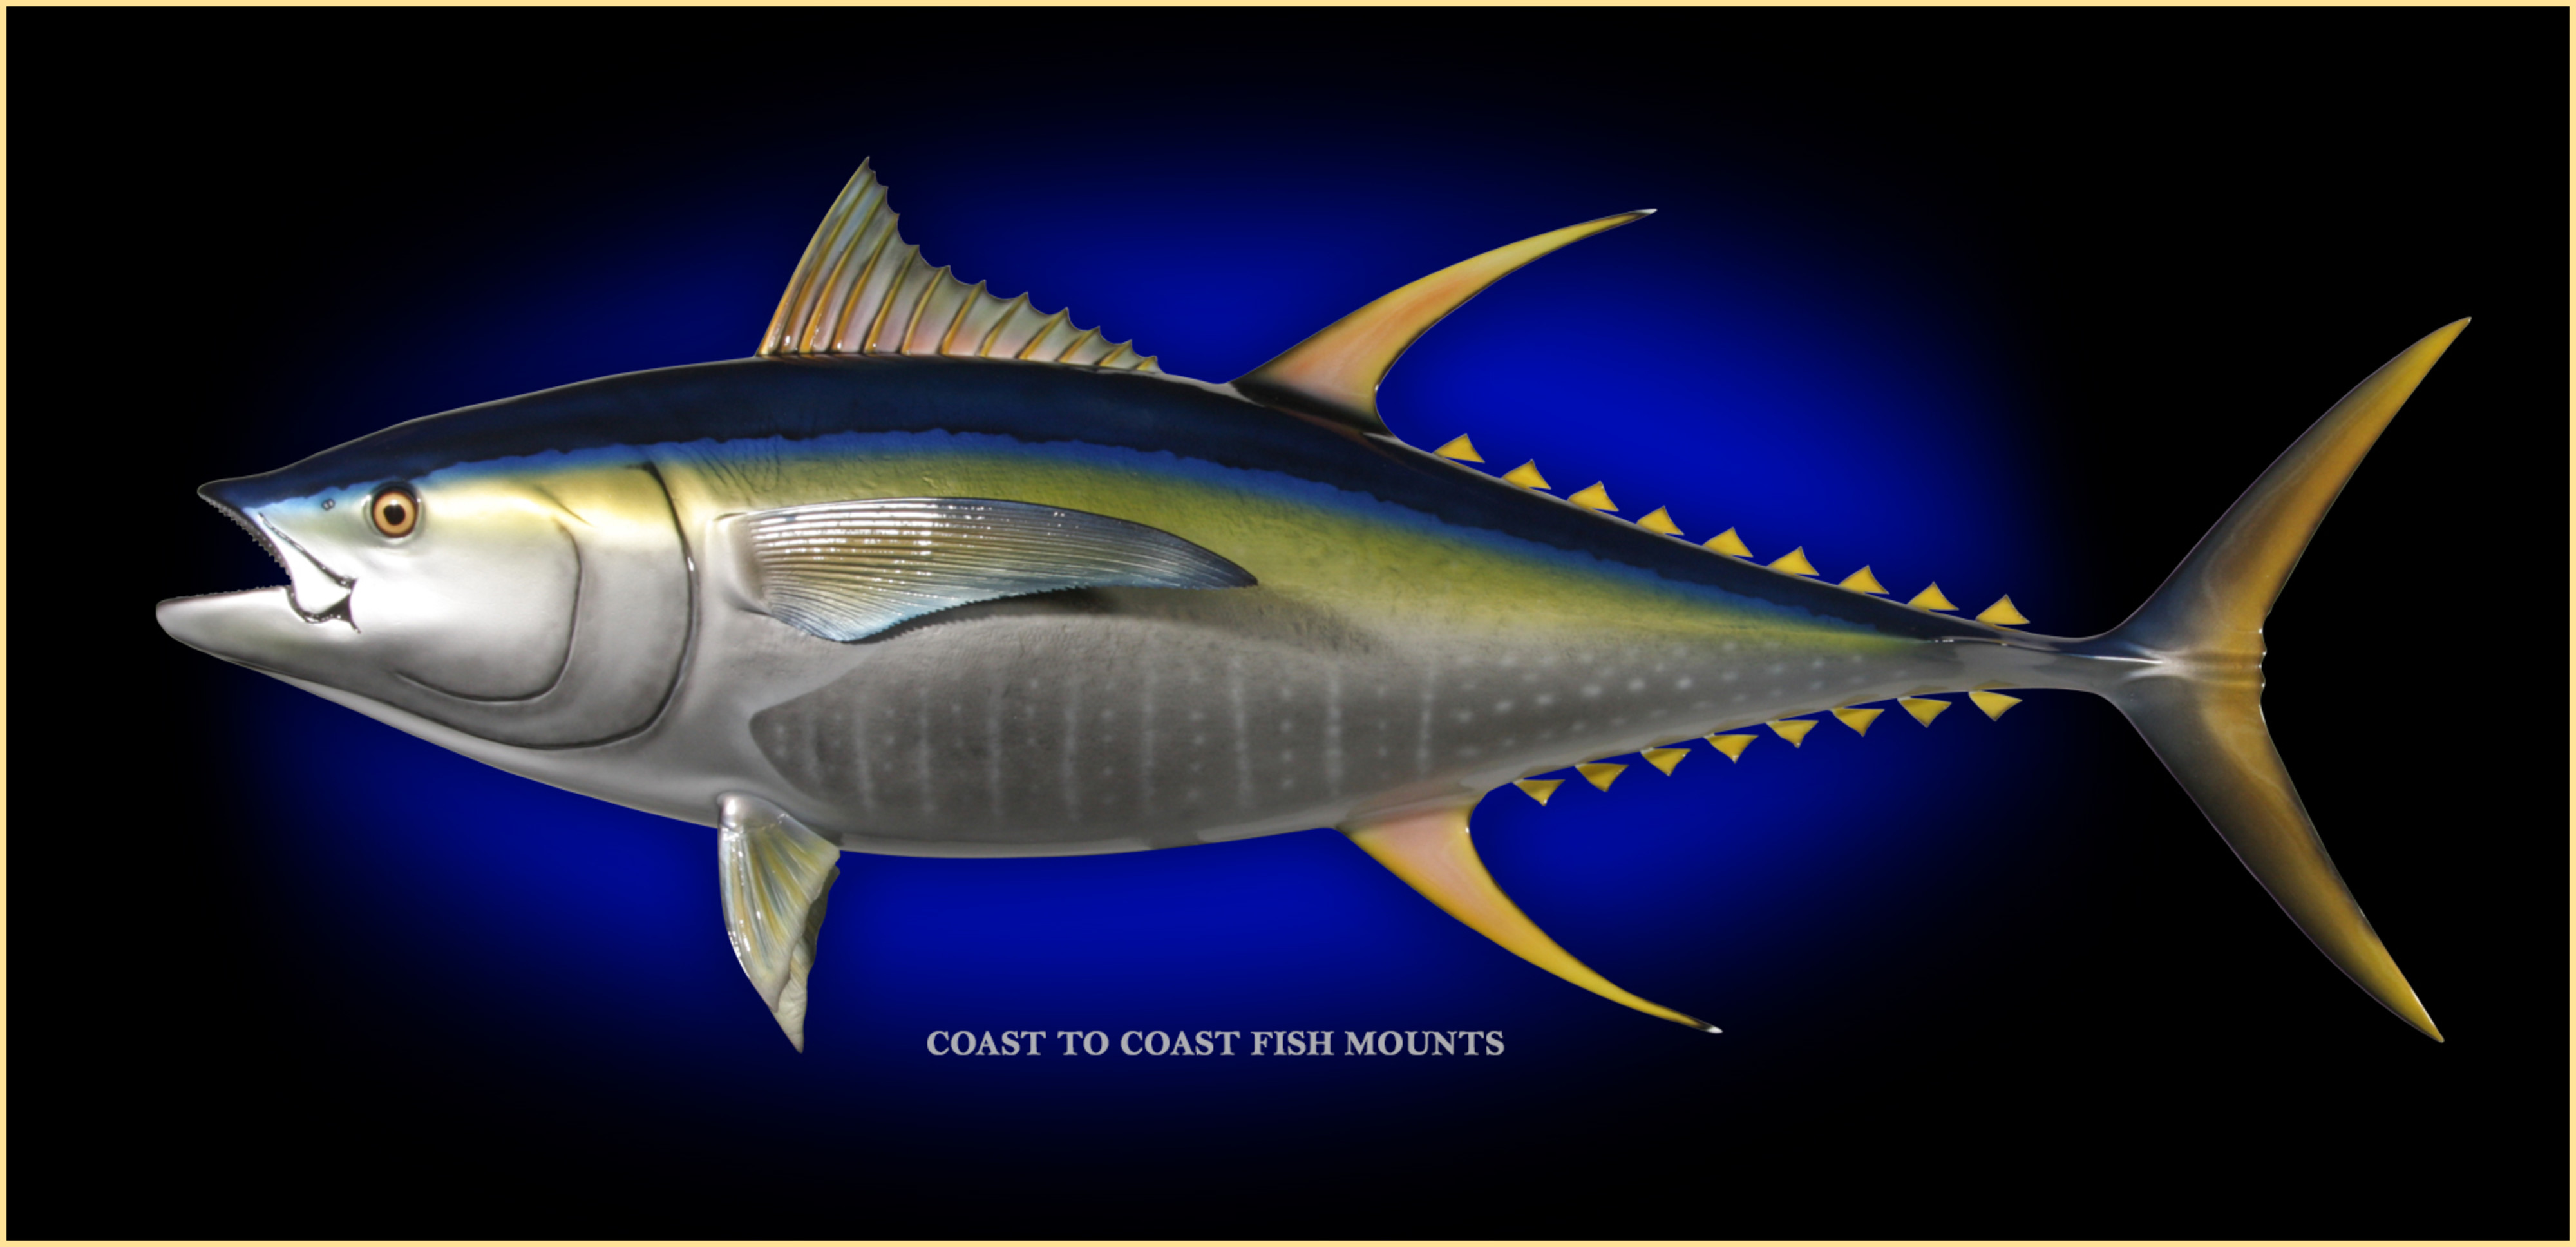 Yellowfin Tuna Fish Mount And Fish Replicas Coast To Coast